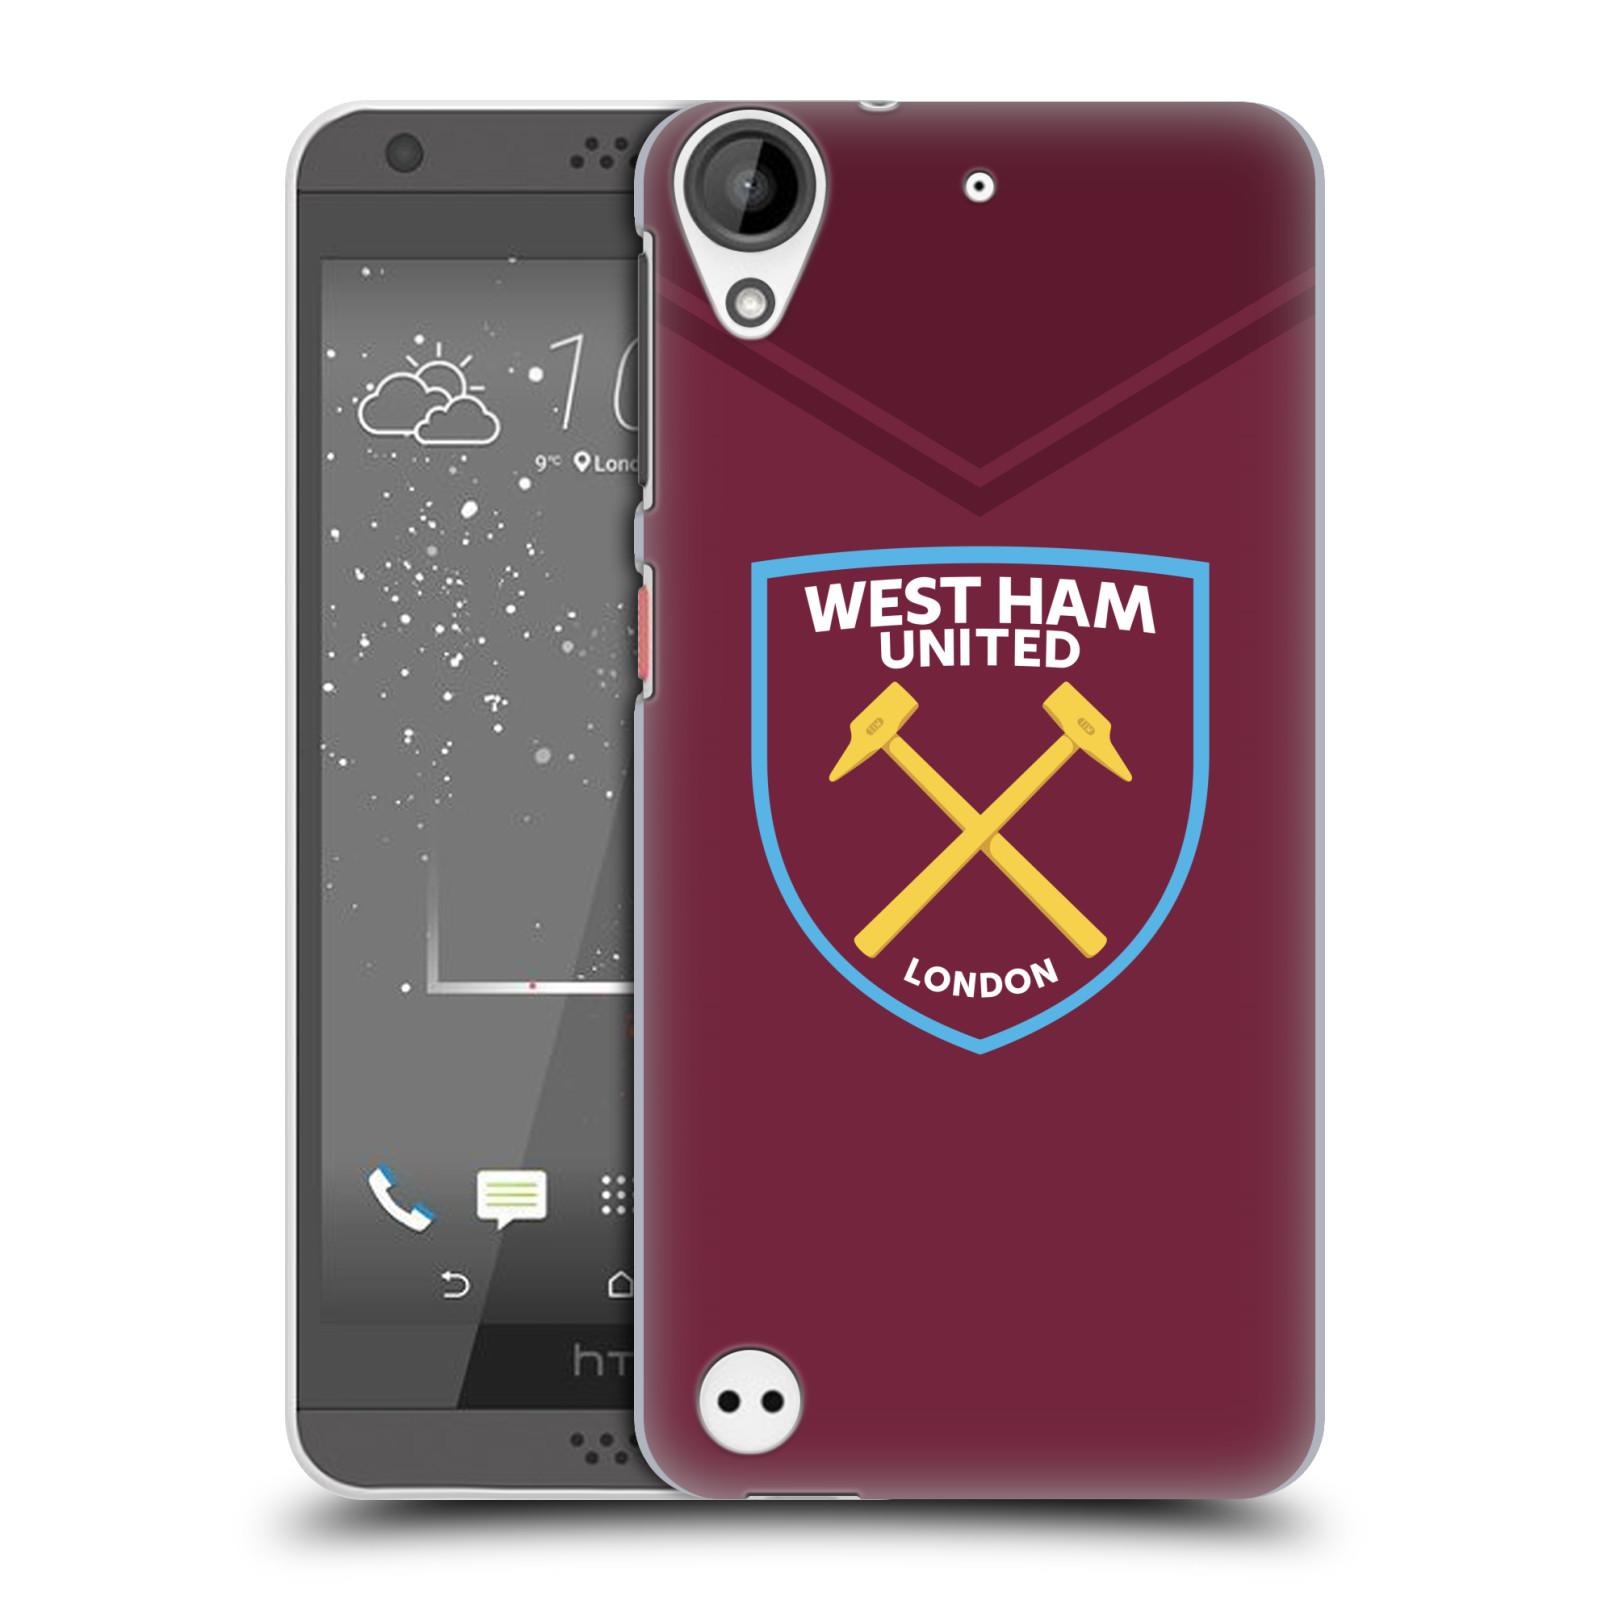 Plastové pouzdro na mobil HTC Desire 530 - Head Case - West Ham United - Logo